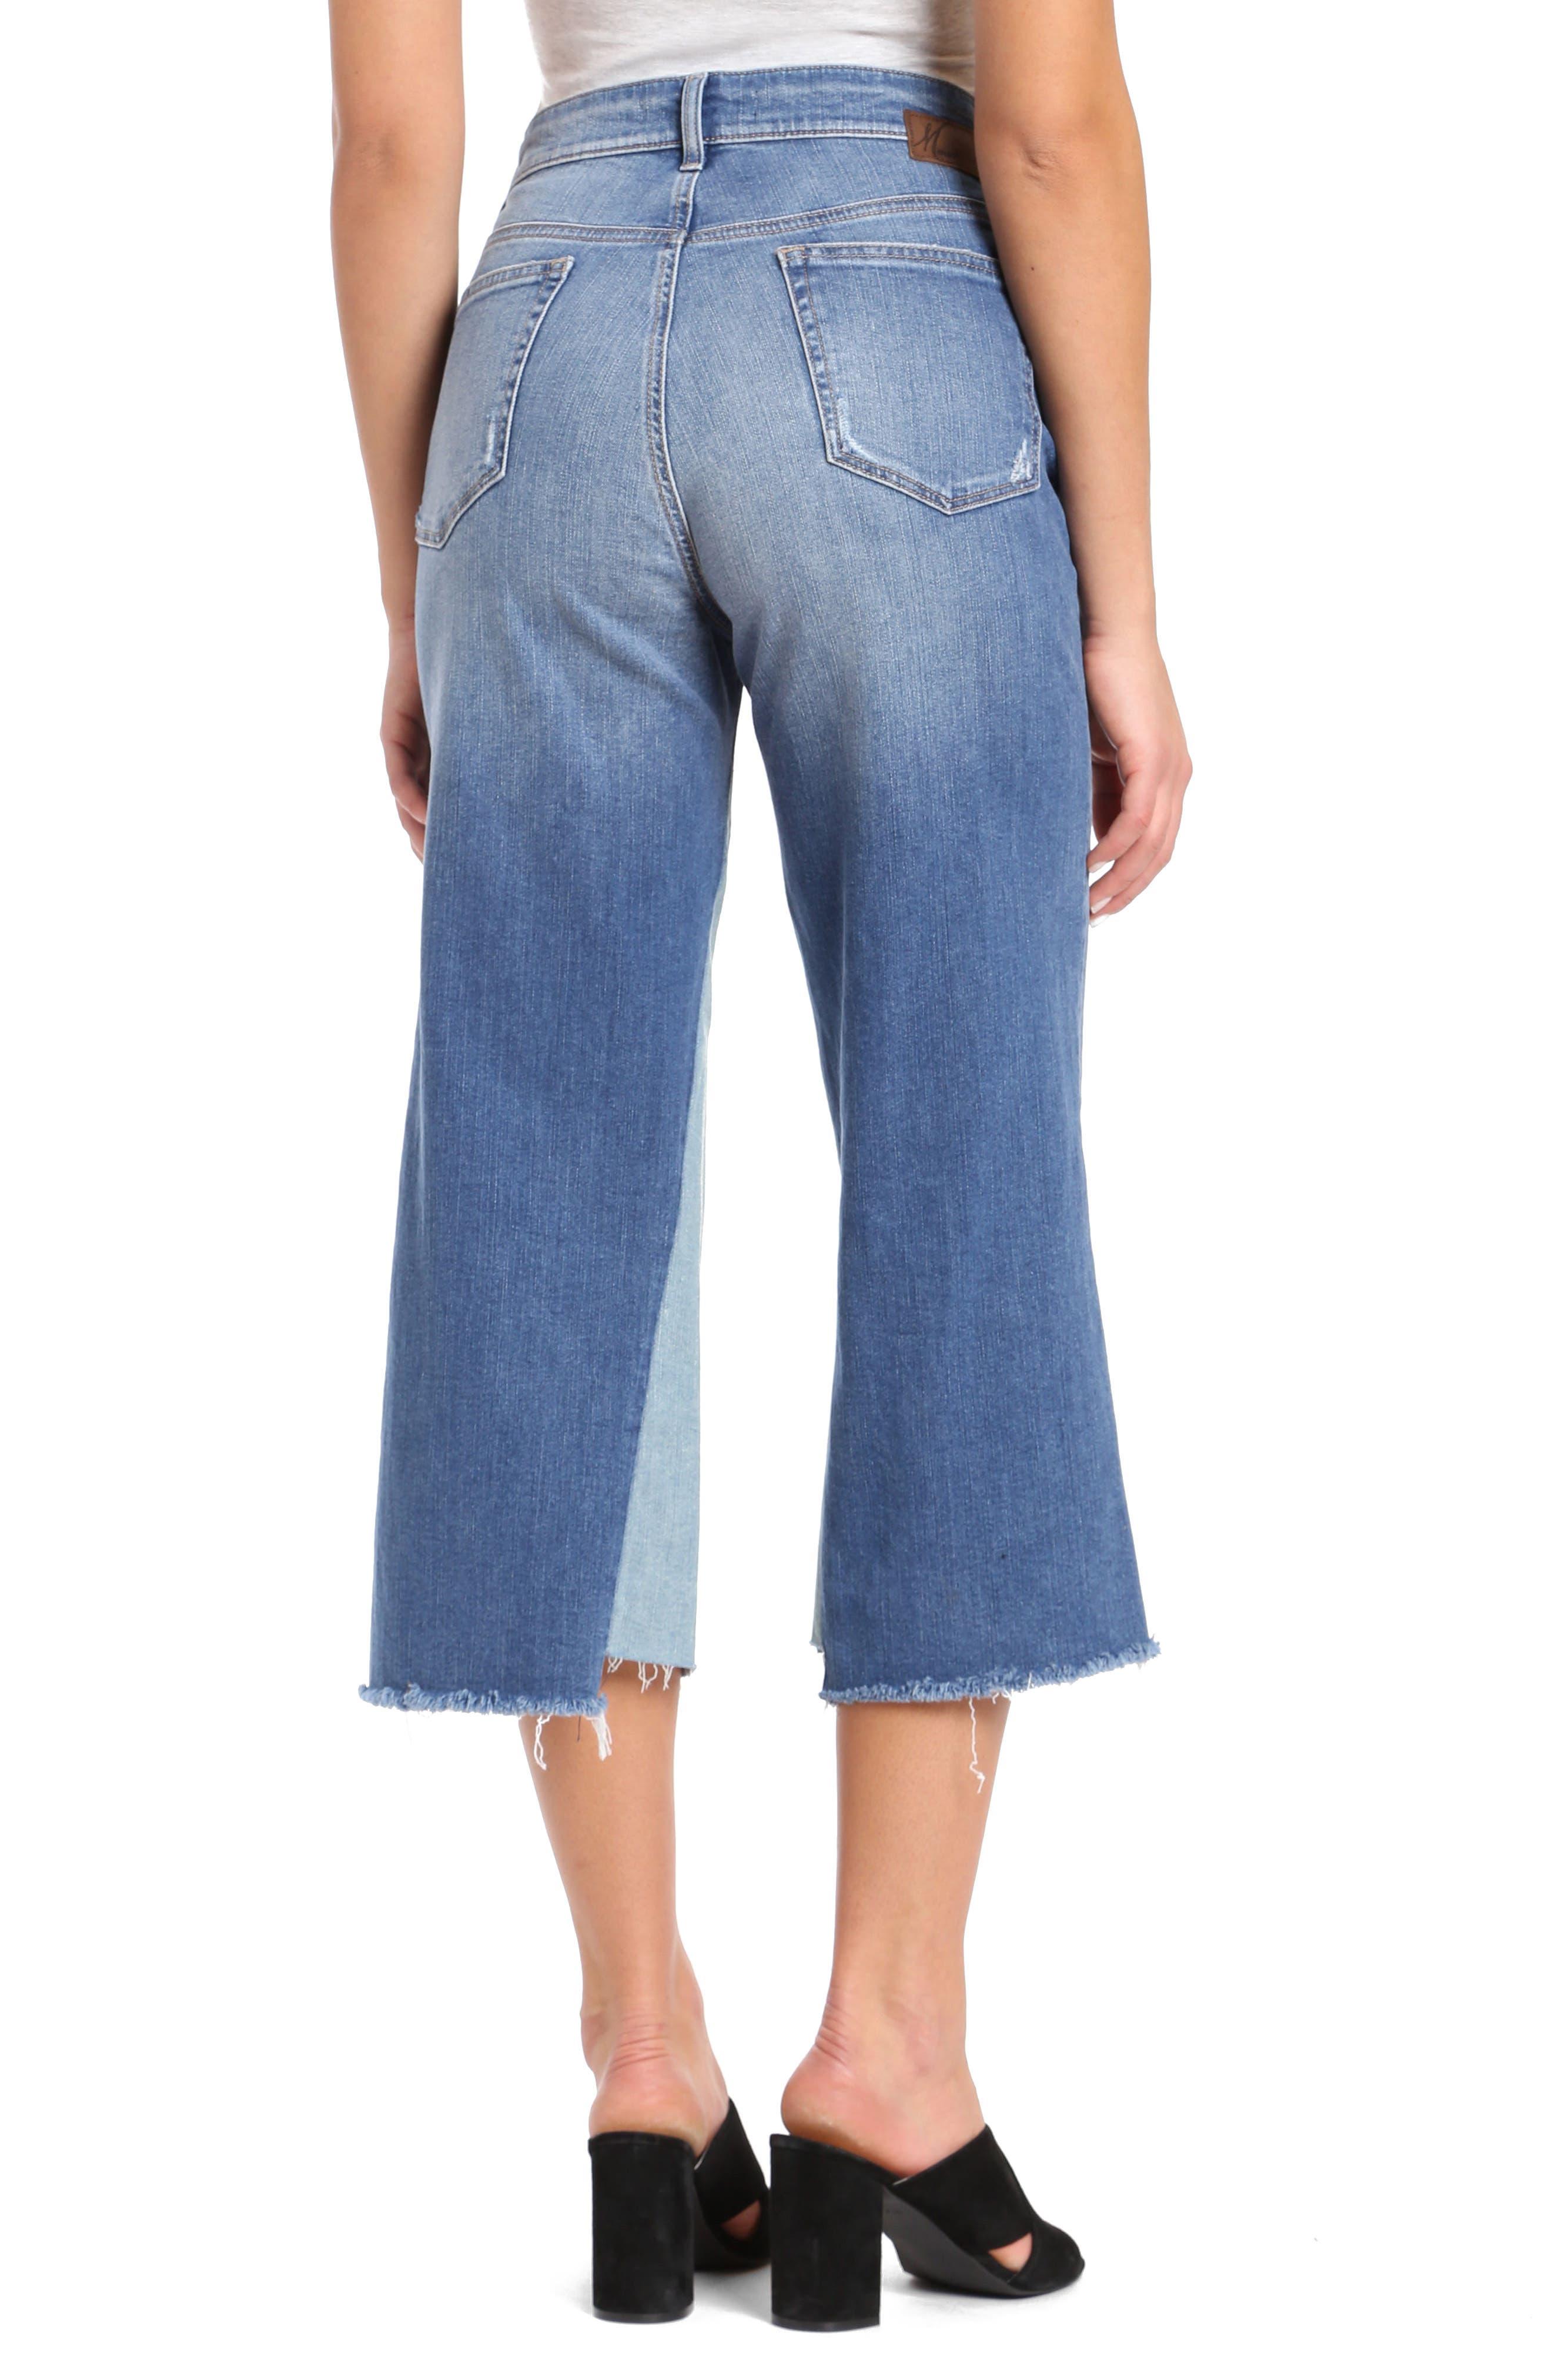 Elliott Wide Leg Contrast Jeans,                             Alternate thumbnail 2, color,                             Mid Shadow